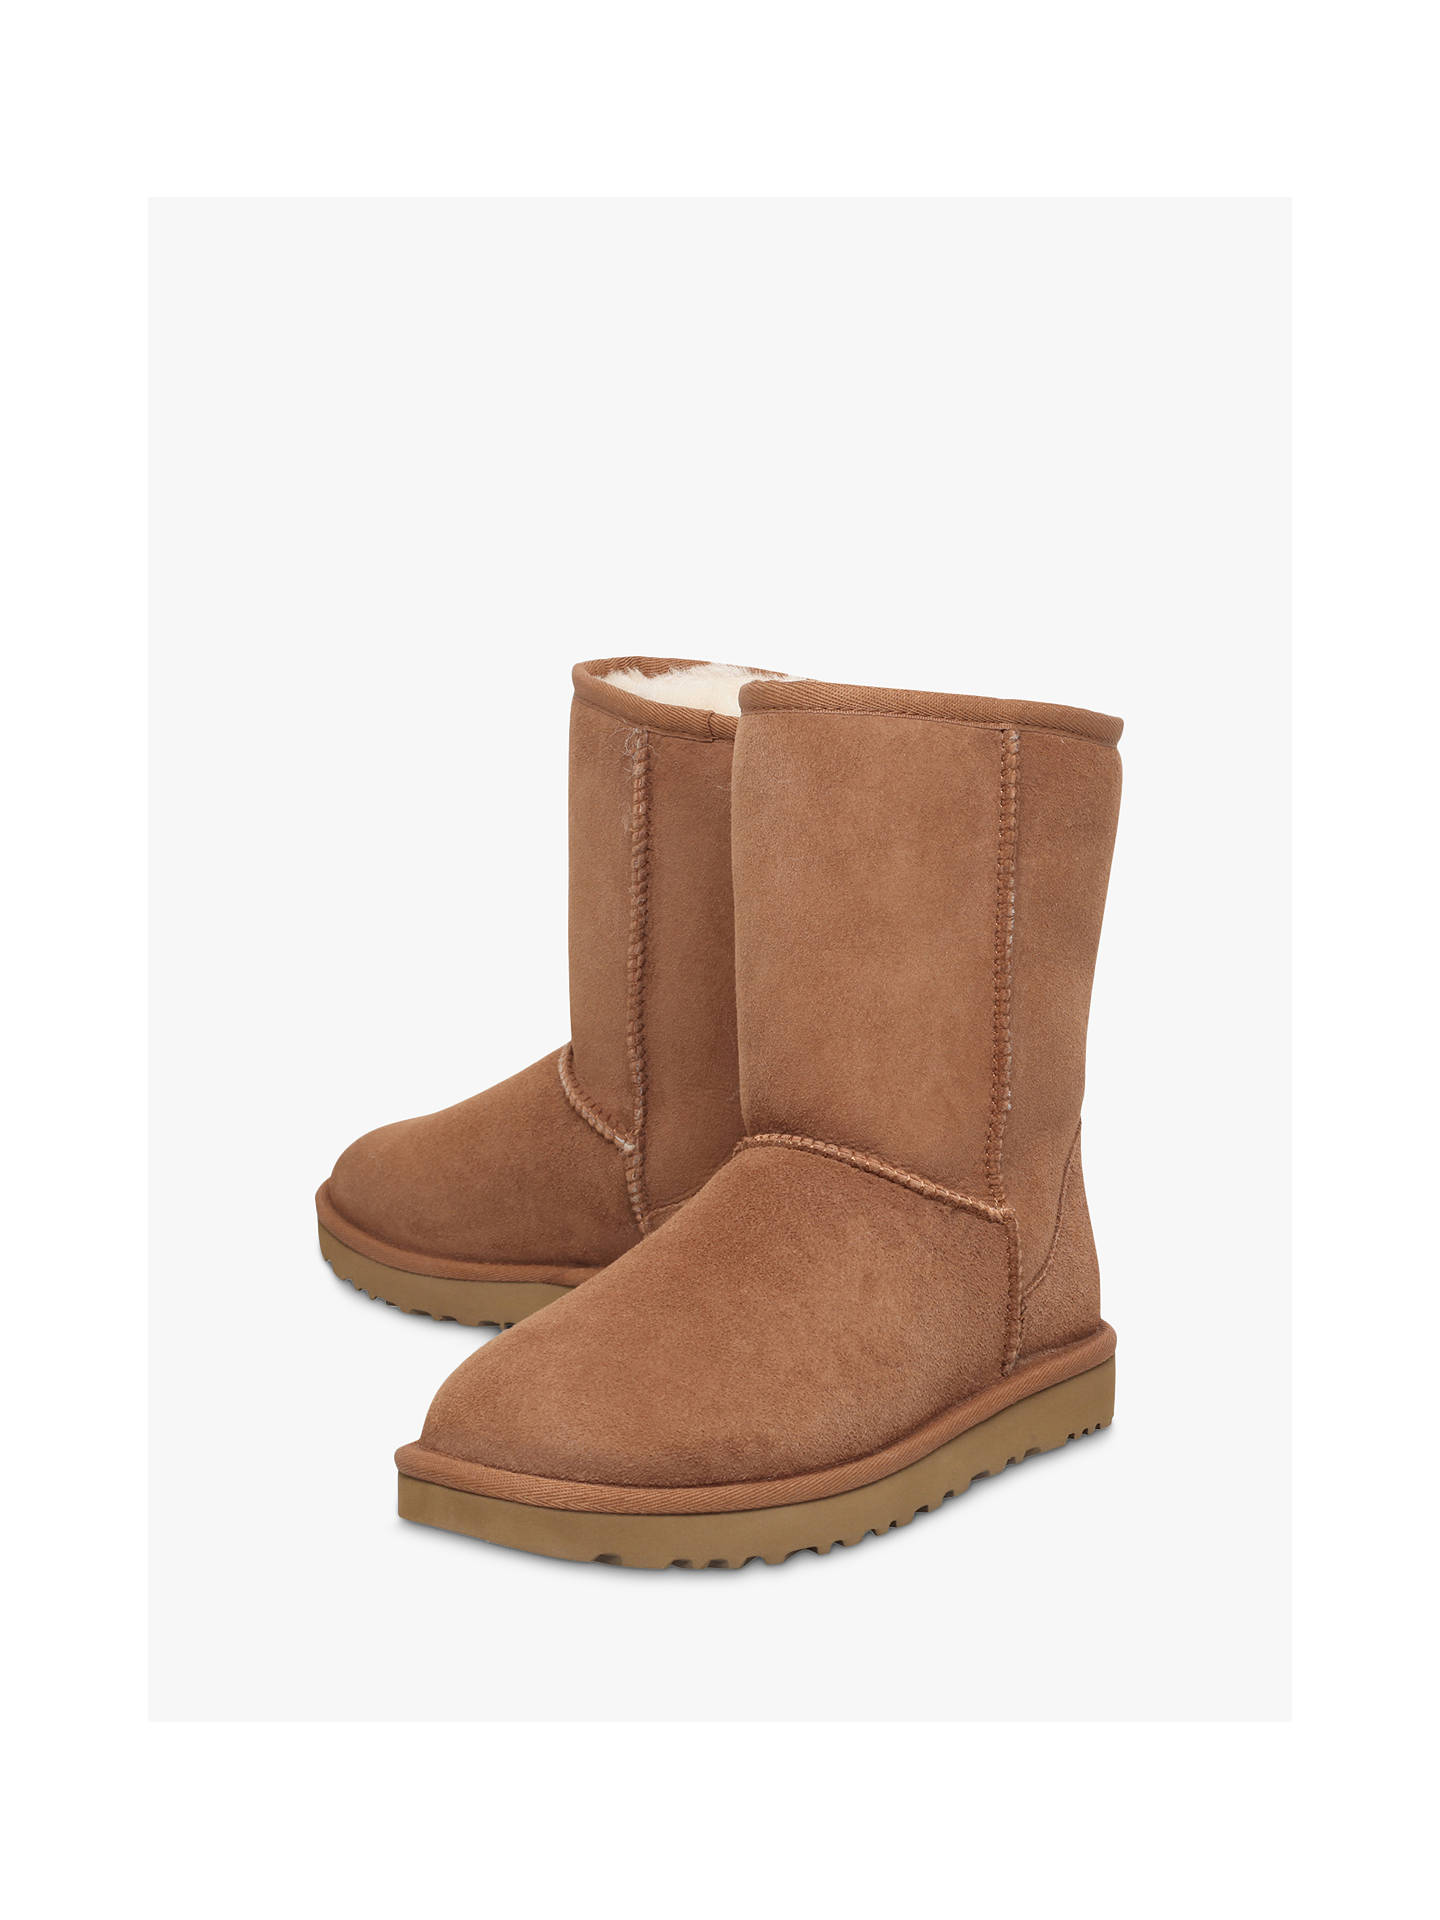 d29ad4b4131 UGG Classic II Short Sheepskin Ankle Boots, Chestnut